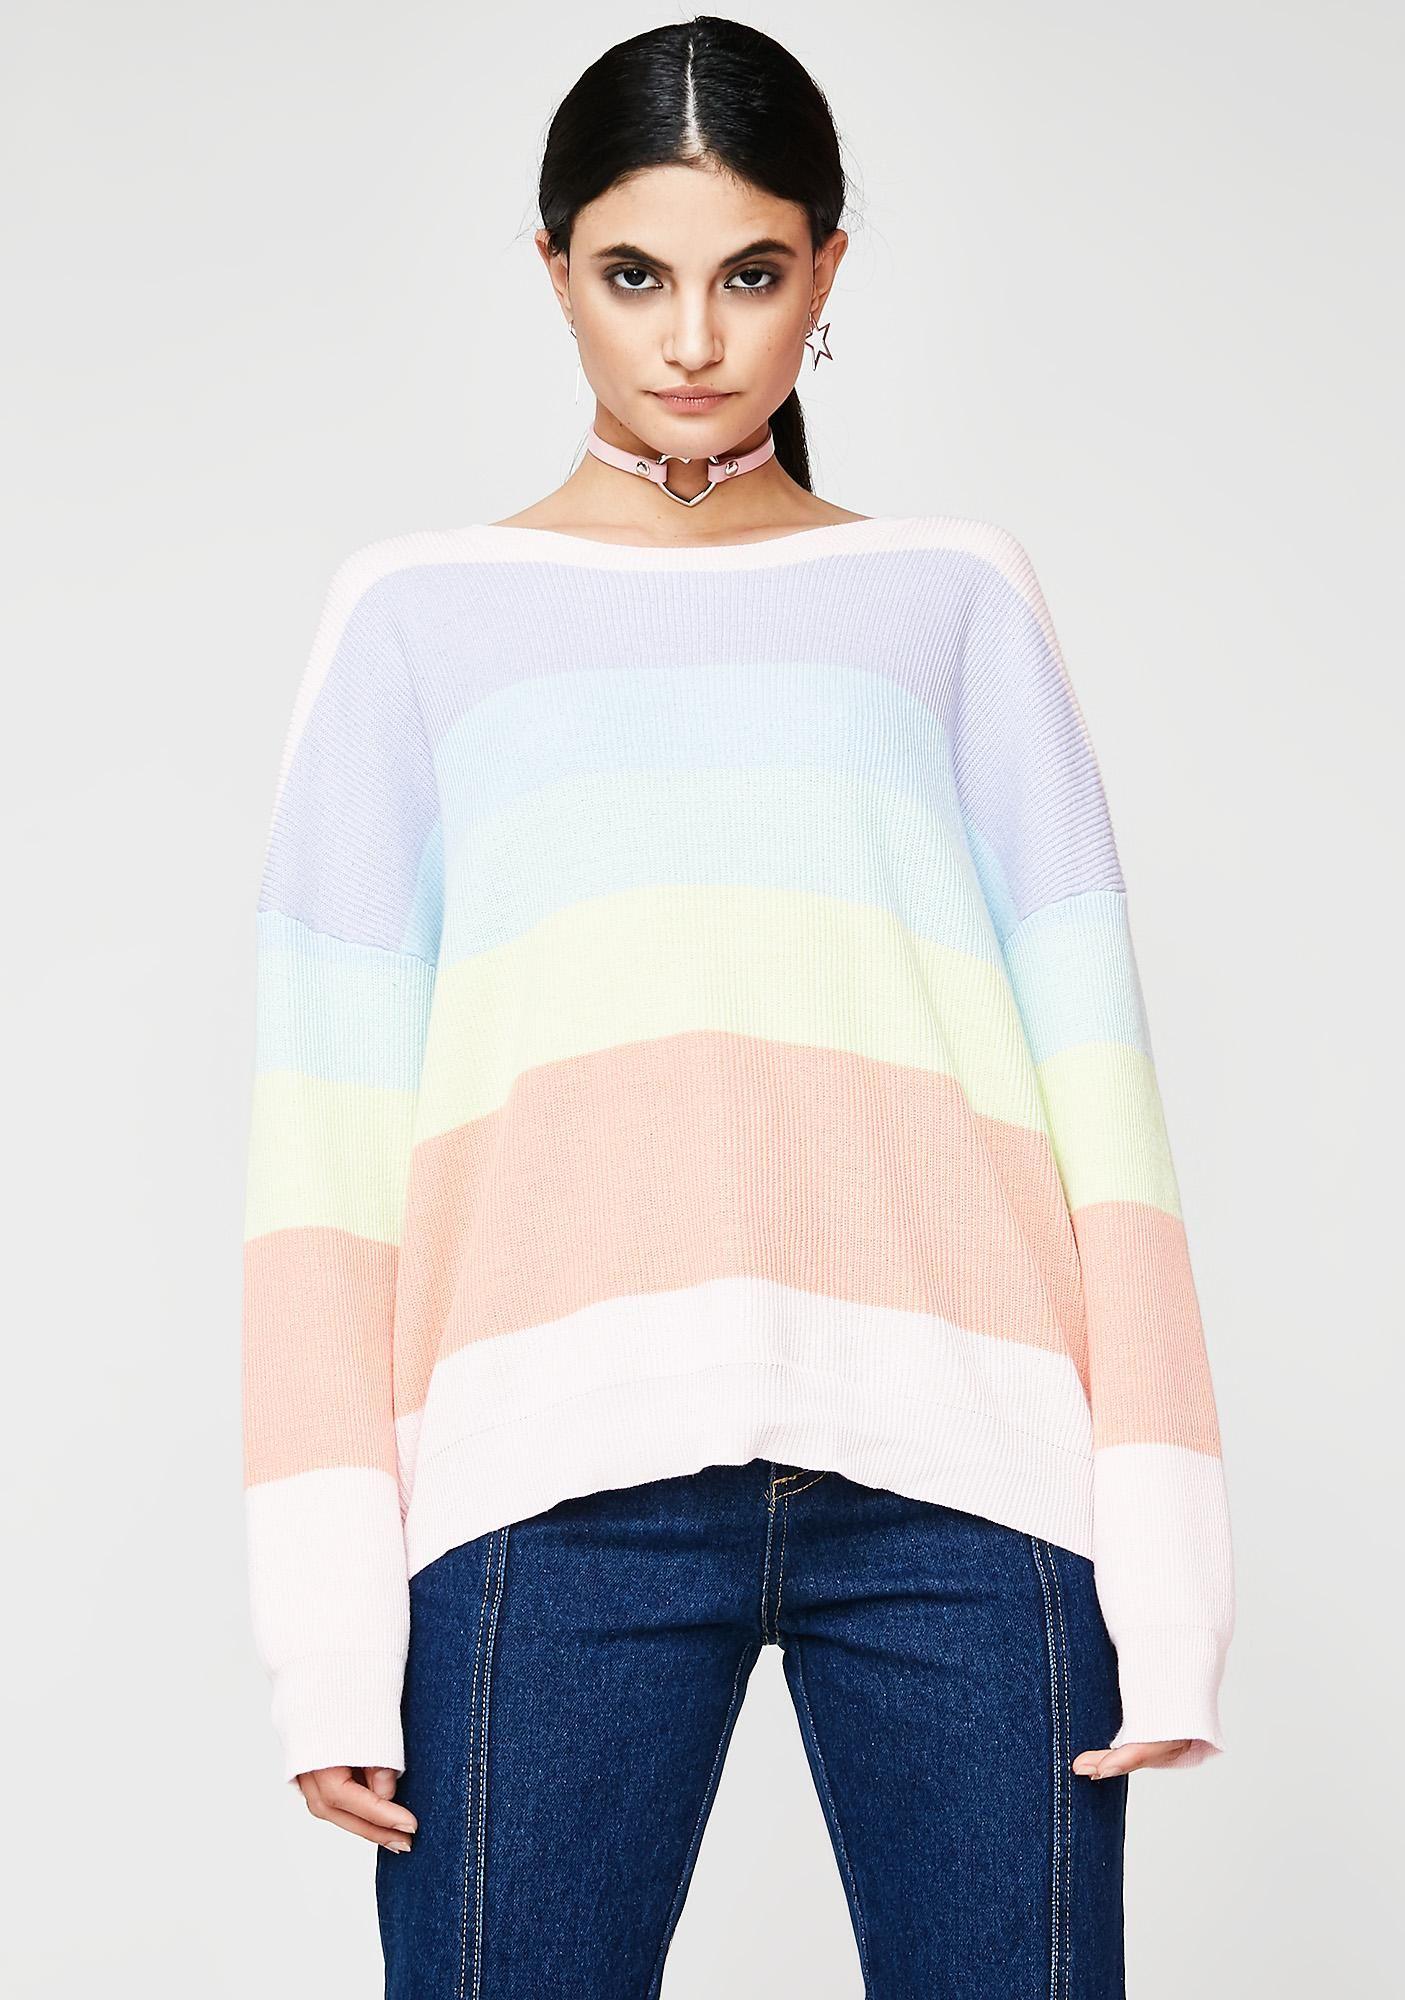 5af6848be2 Walkin  On Sunshine Sweater got ya feelin  bright. This cozy sweater has a  round neckline